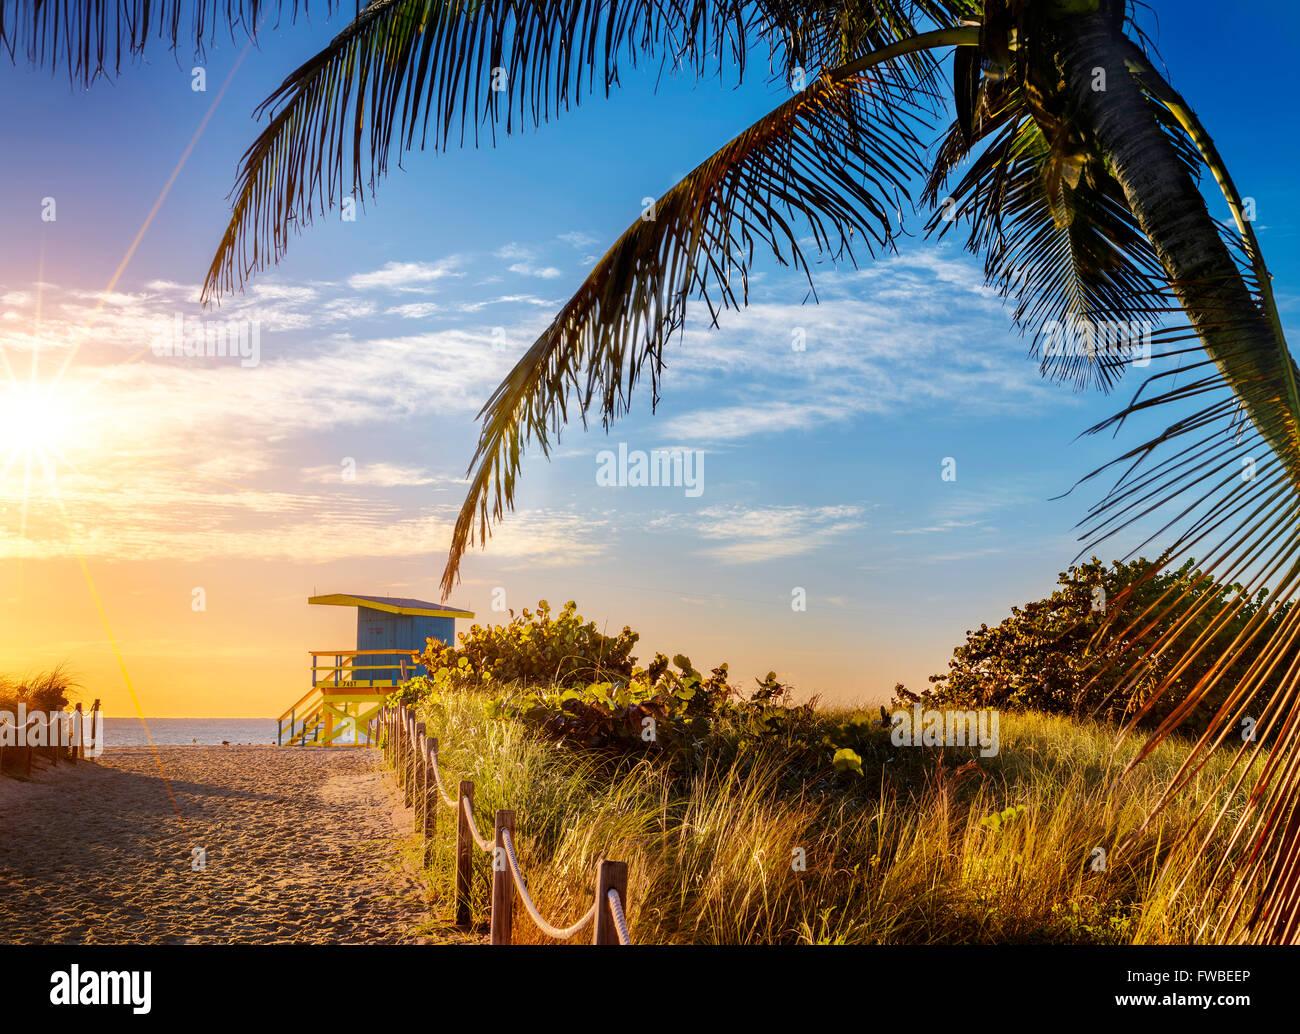 Colorful Lifeguard Tower in South Beach, Miami Beach, Florida, USA - Stock Image